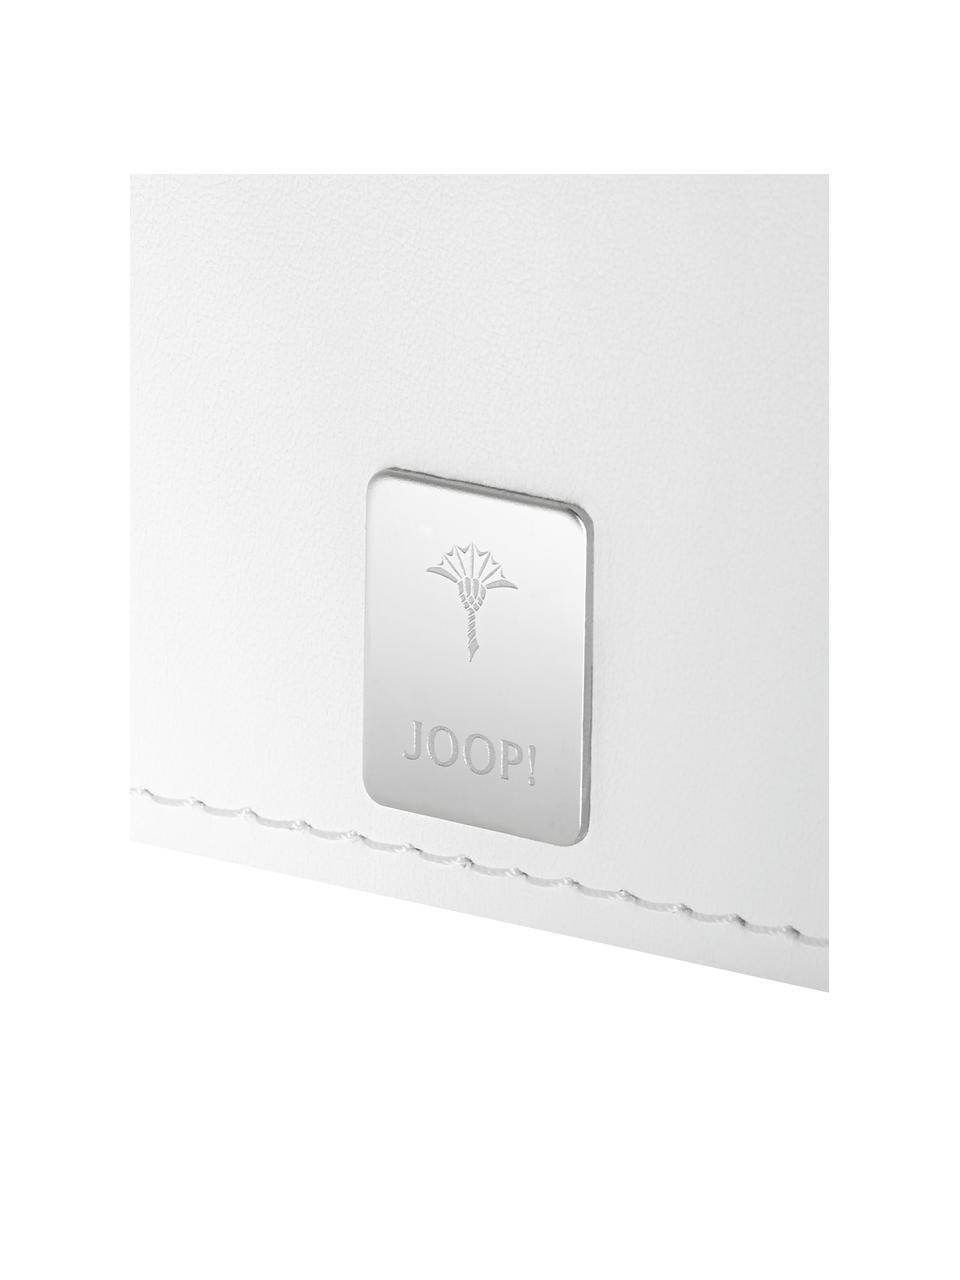 Kosmetiktuchbox Polly aus Kunstleder, Kunstharz, Kunstleder, Reinweiß, 13 x 13 cm